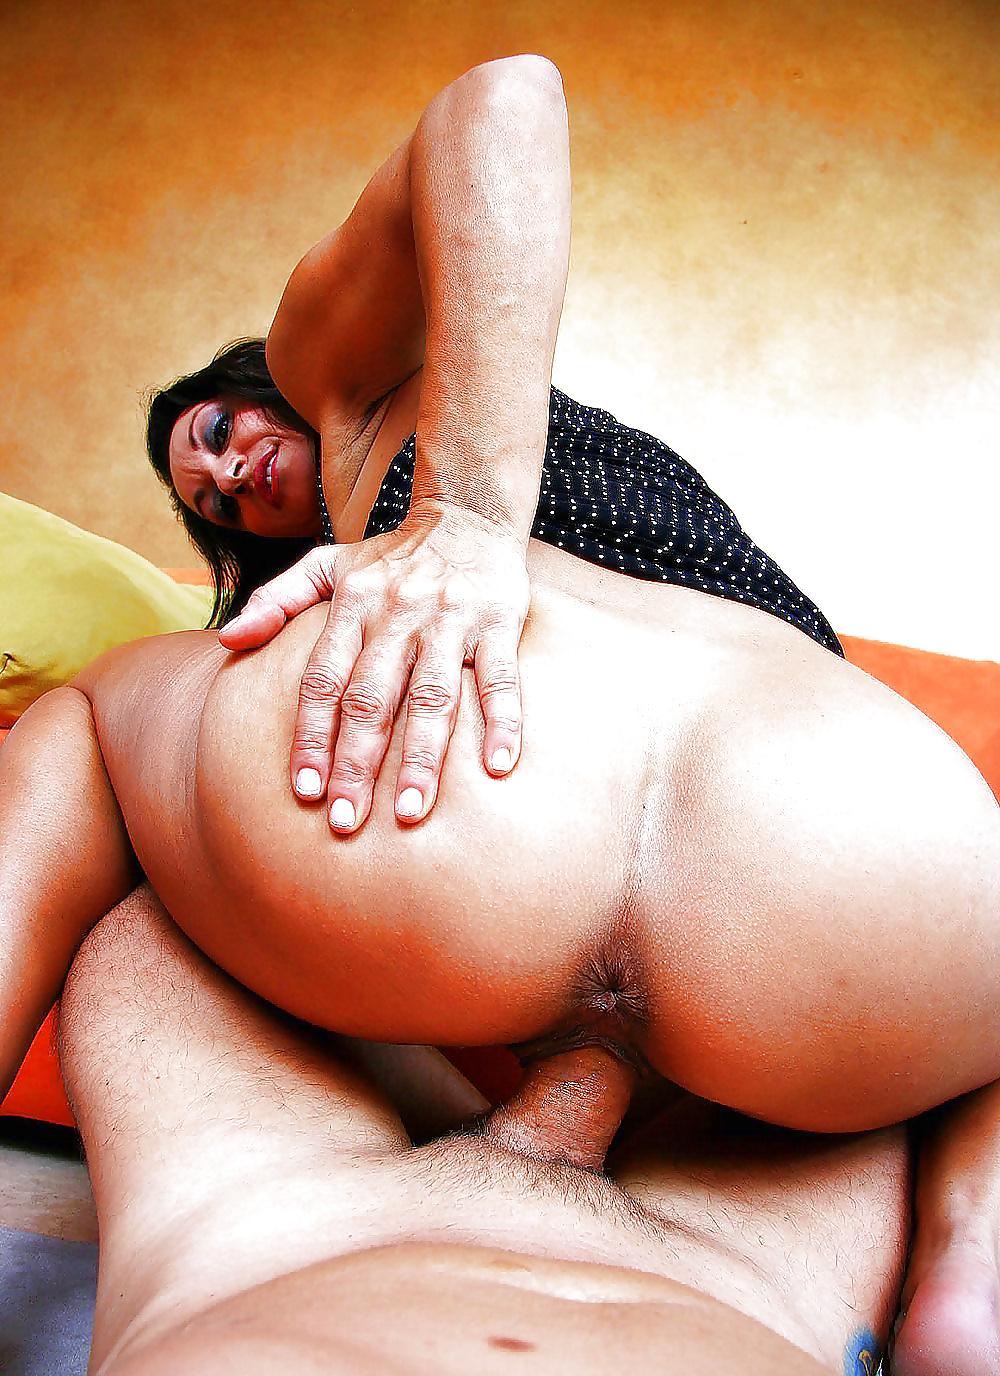 persian-anal-pics-russian-half-sex-girl-free